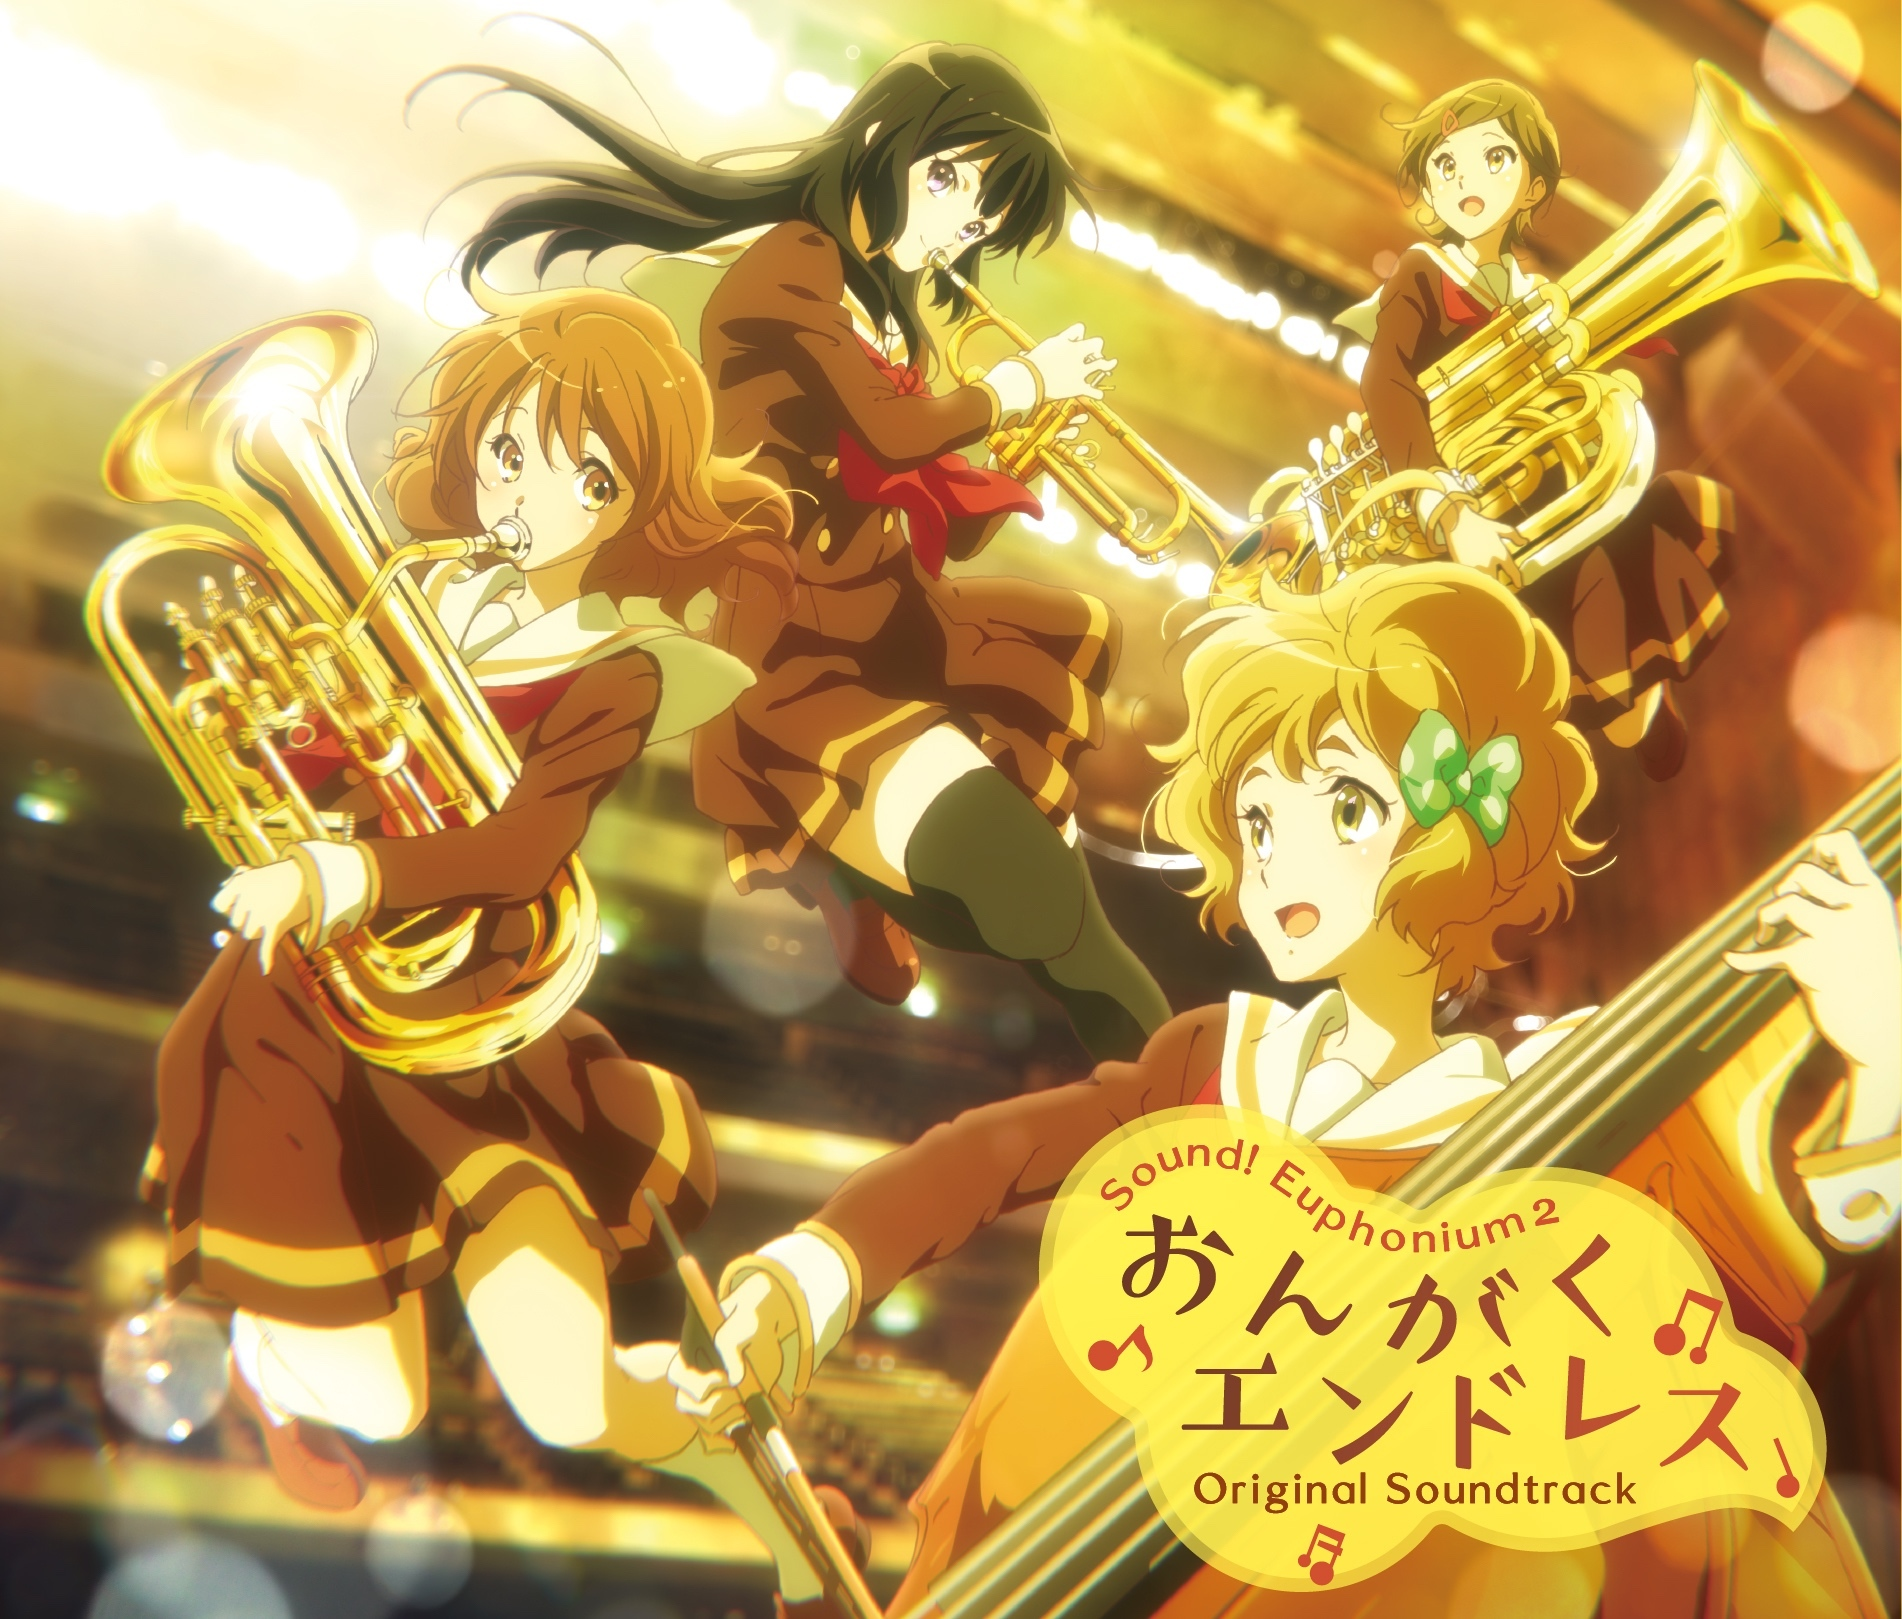 TVアニメ『響け!ユーフォニアム2』 オリジナルサウンドトラック おんがくエンドレス